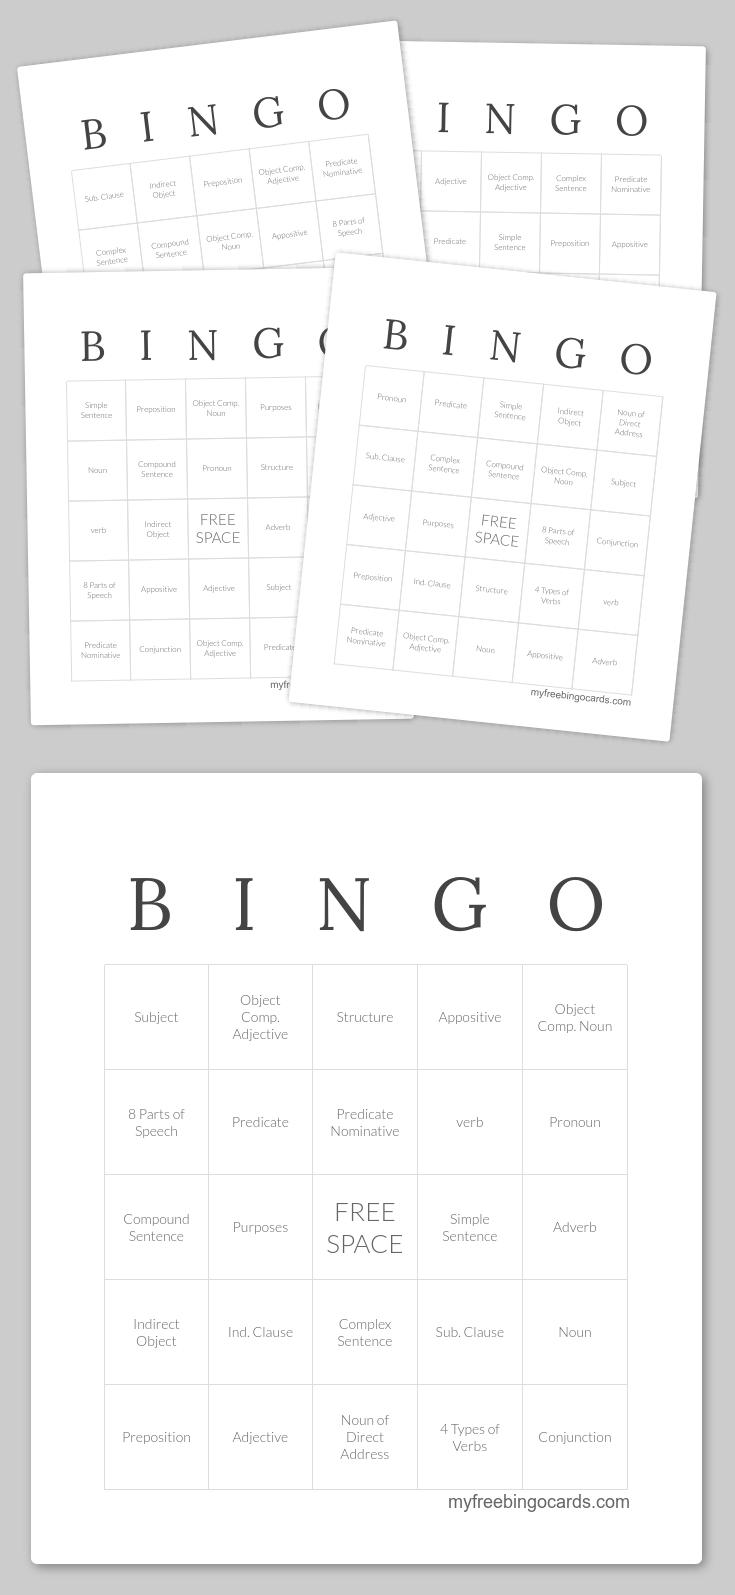 B I N G O Bingo | Classical Conversations | Bingo, Bingo Cards, Free - Free Printable Parts Of Speech Bingo